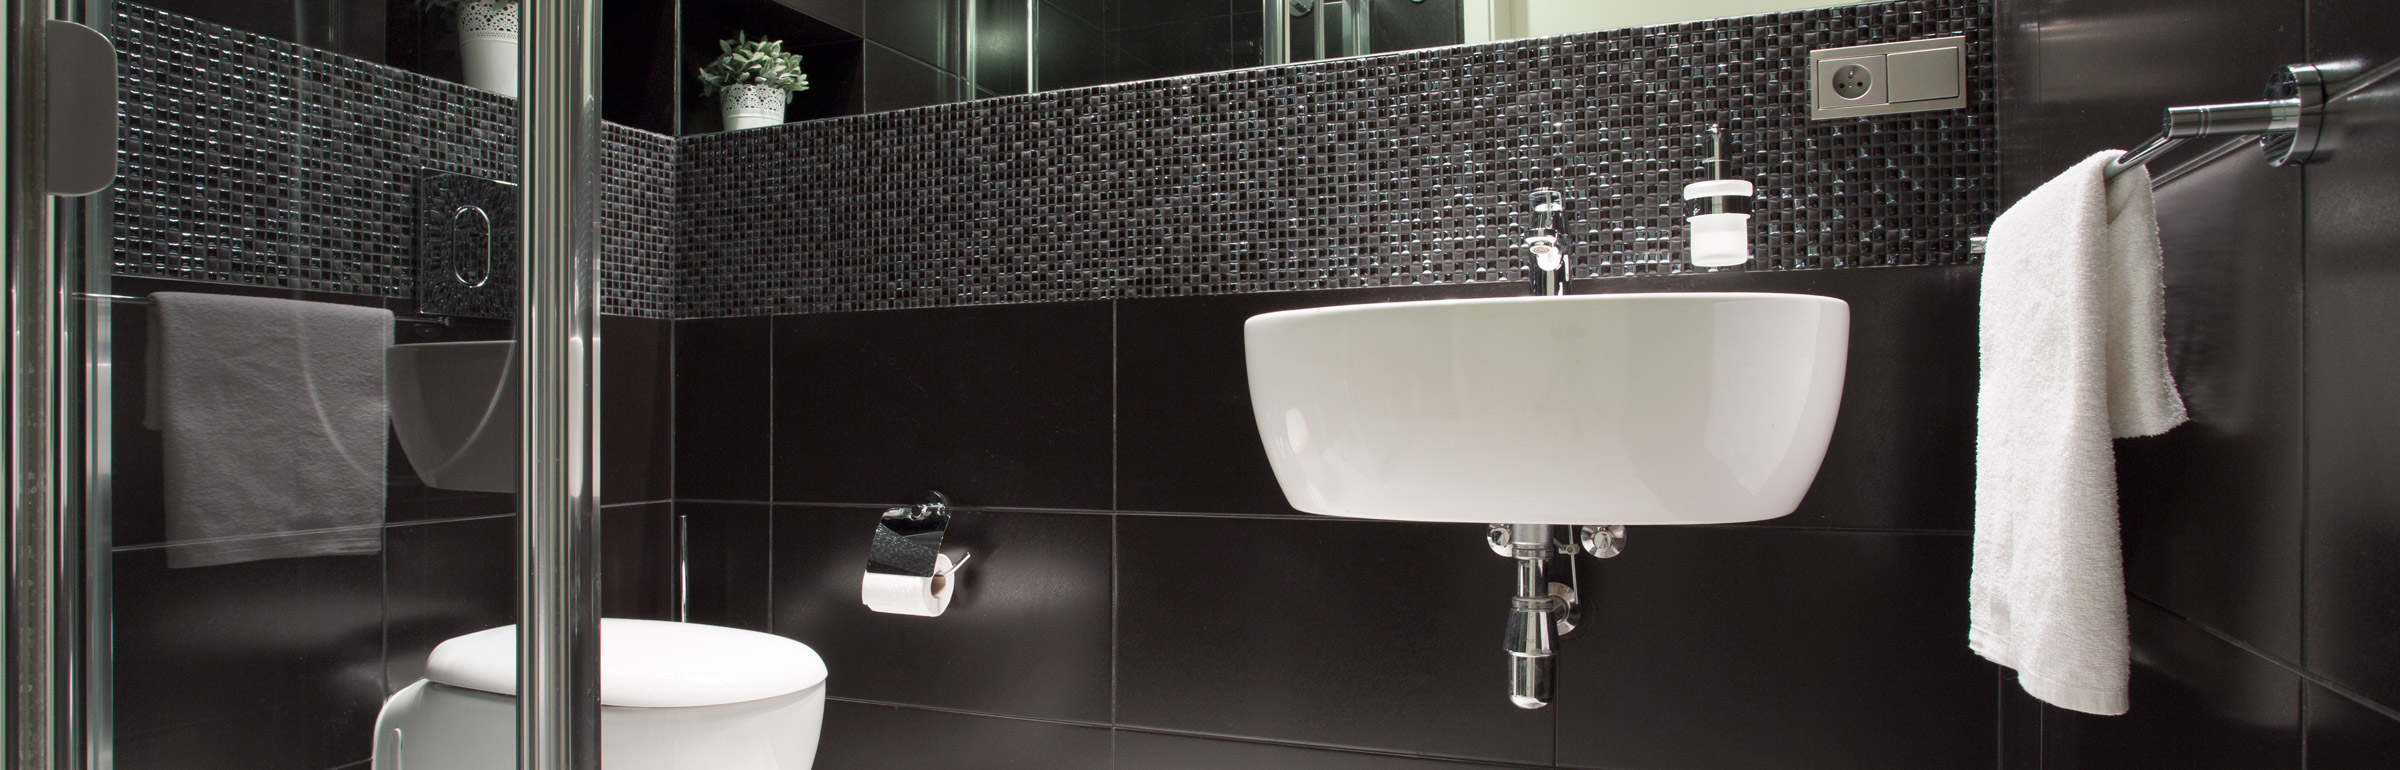 quantumkbstore chicago kitchen faucets Shop Bathroom